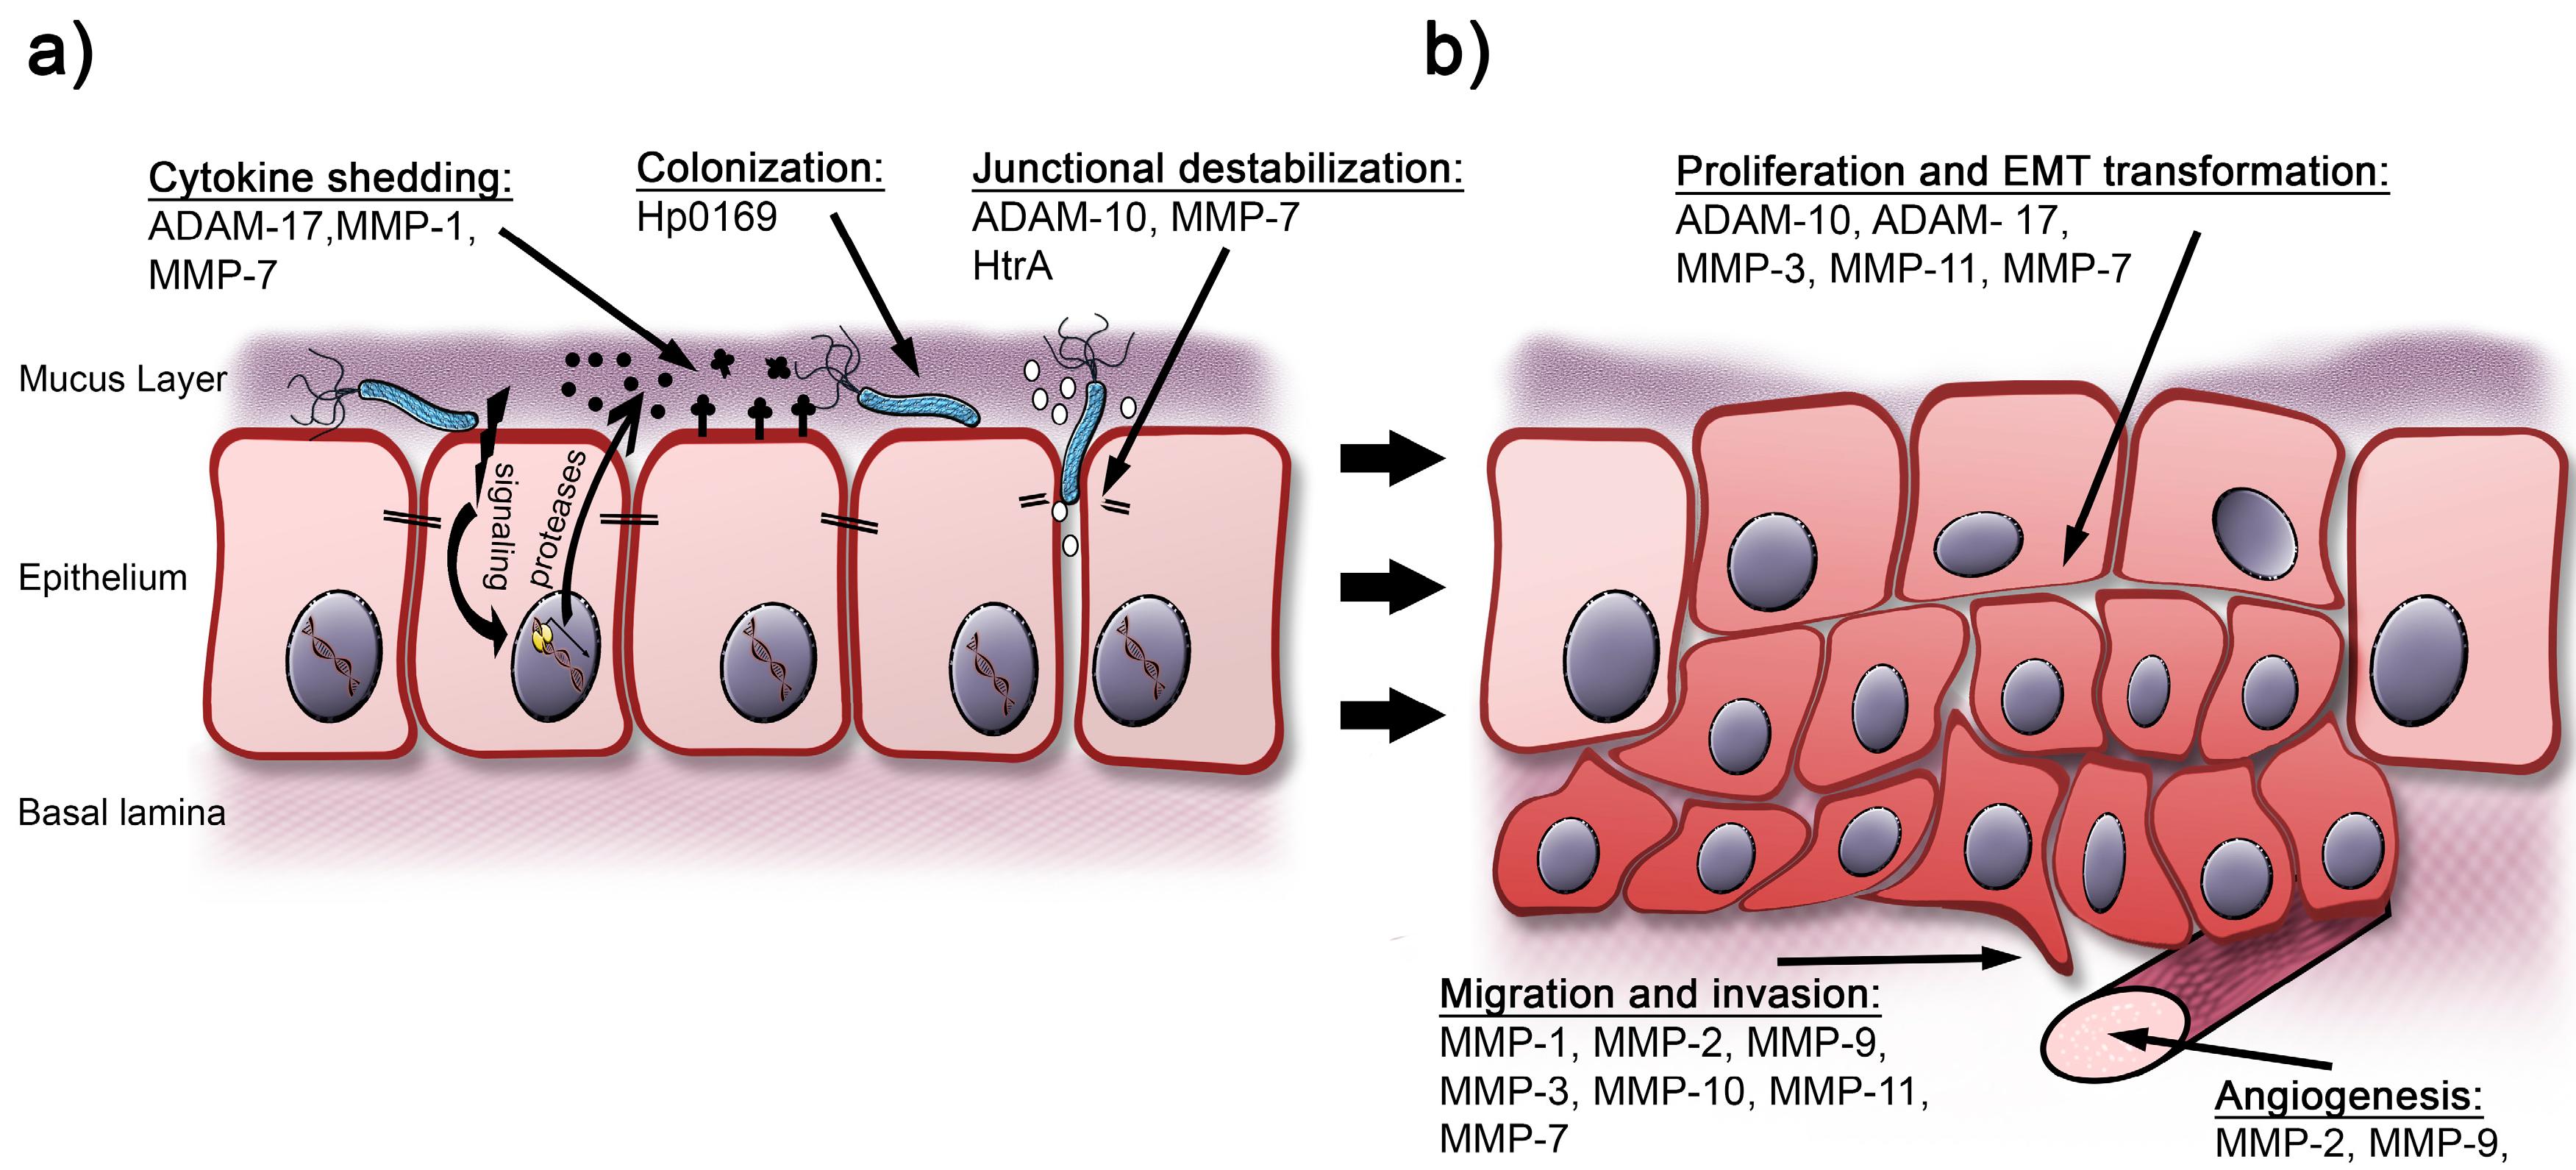 cancer gastric helicobacter clinici de tratament pentru viermi